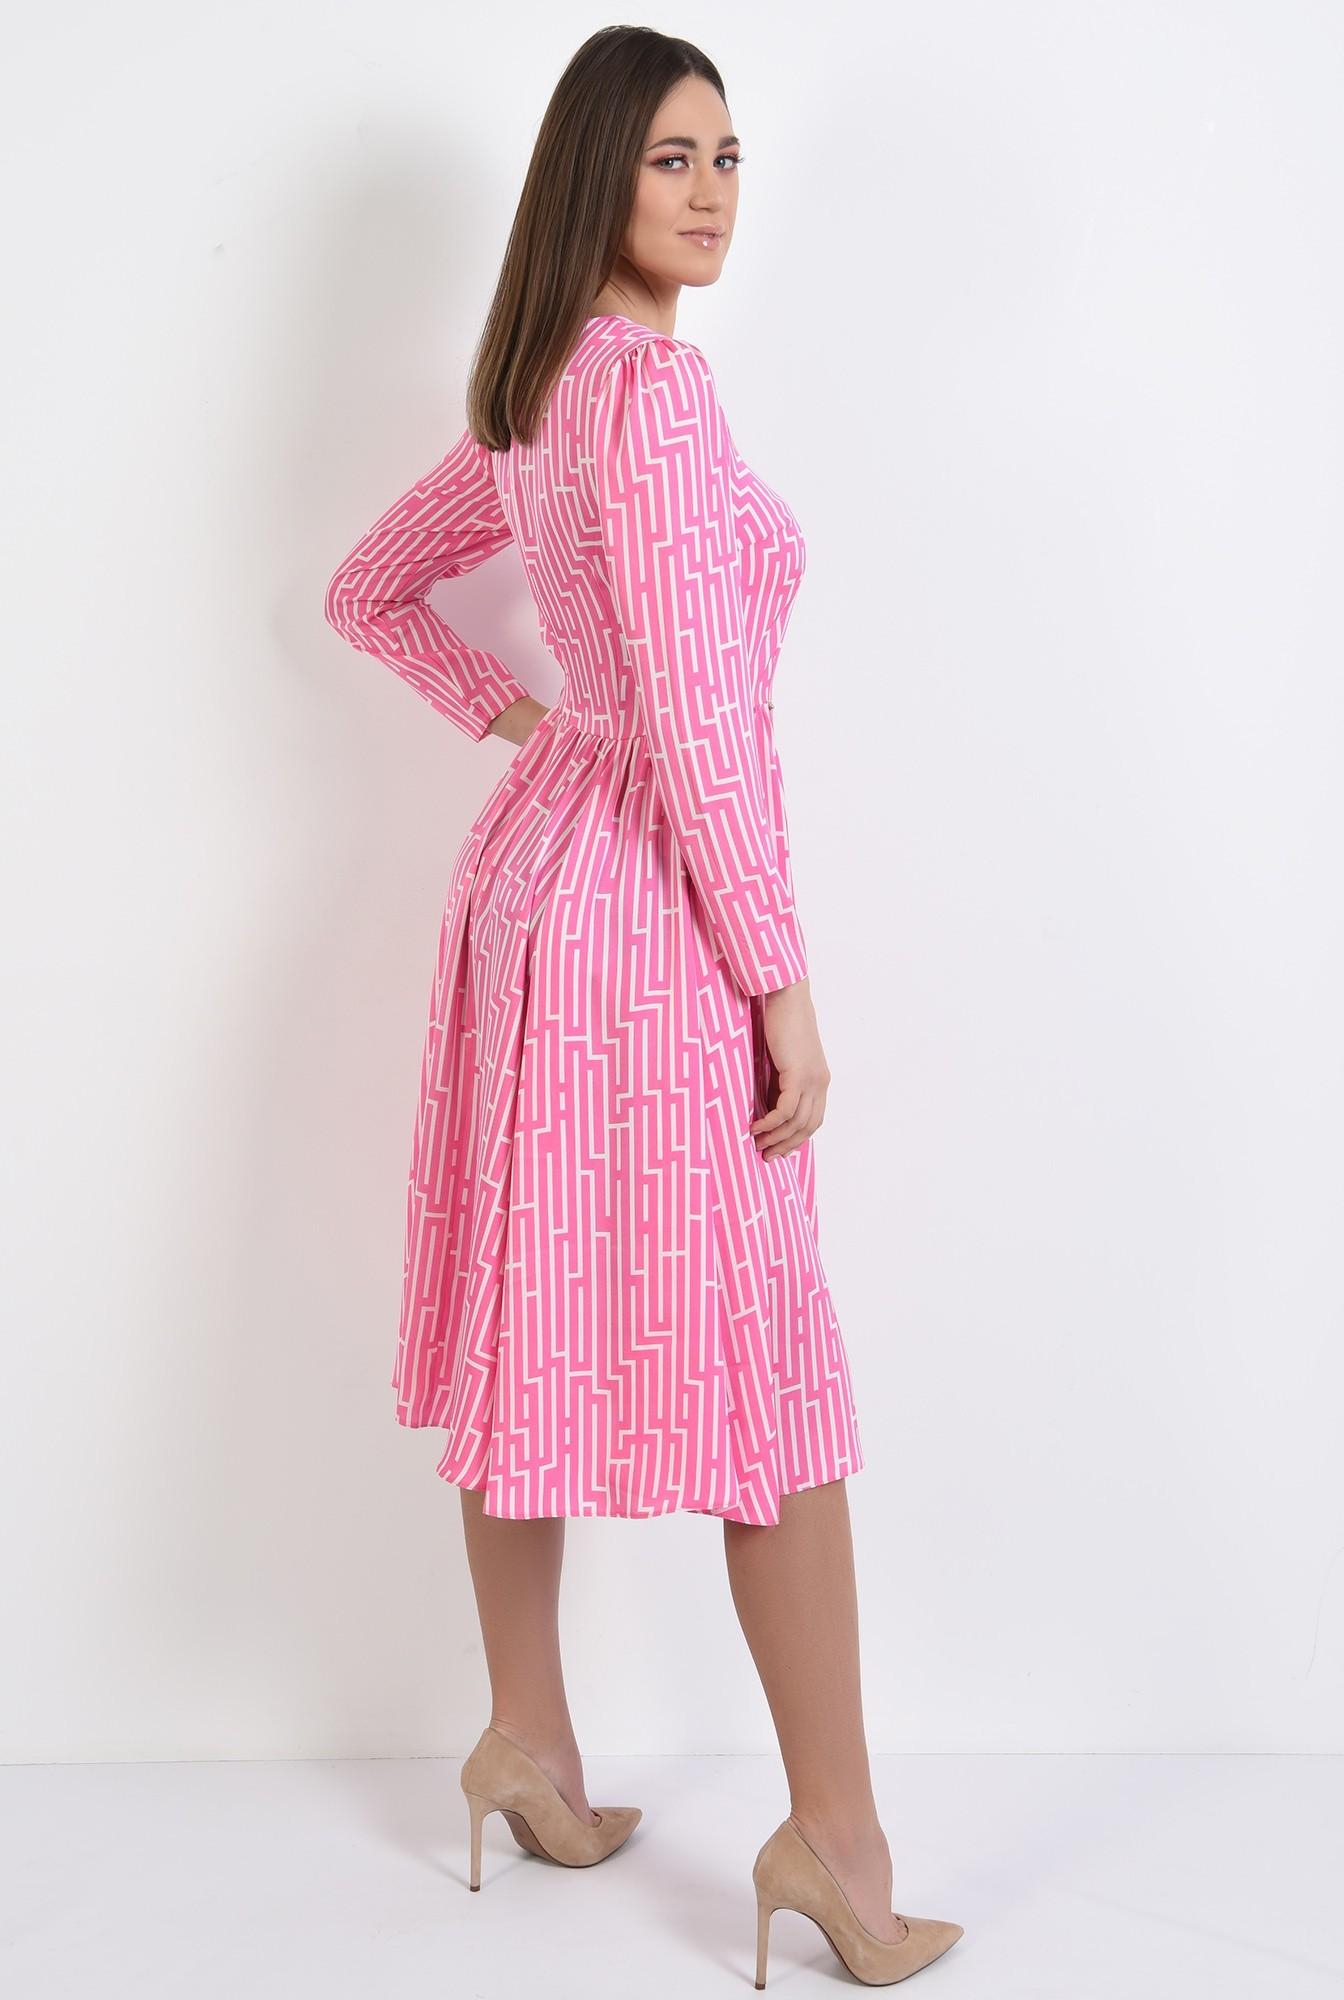 1 - rochie midi, evazata, cu motive geometrice, maneci lungi, roz